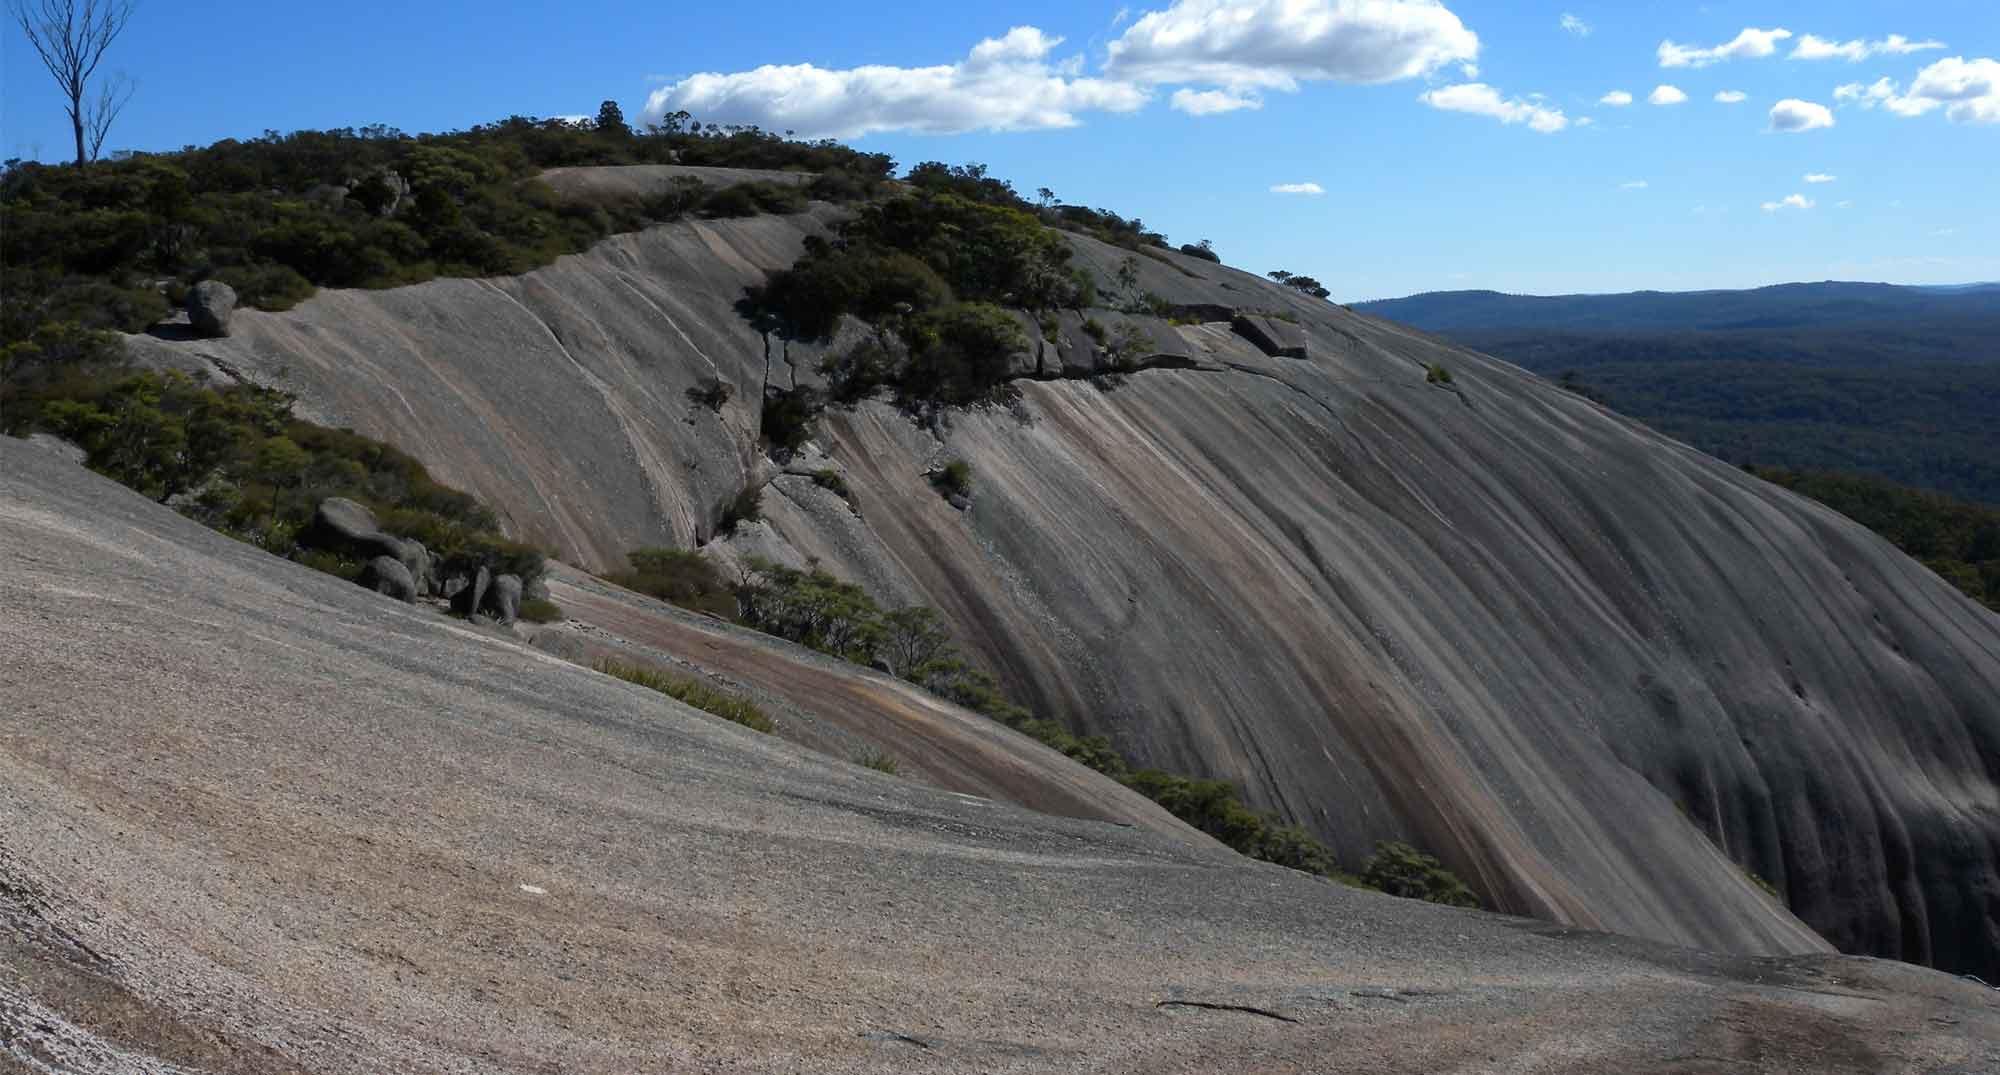 RELAX & REVIVE: Bald Rock National Park